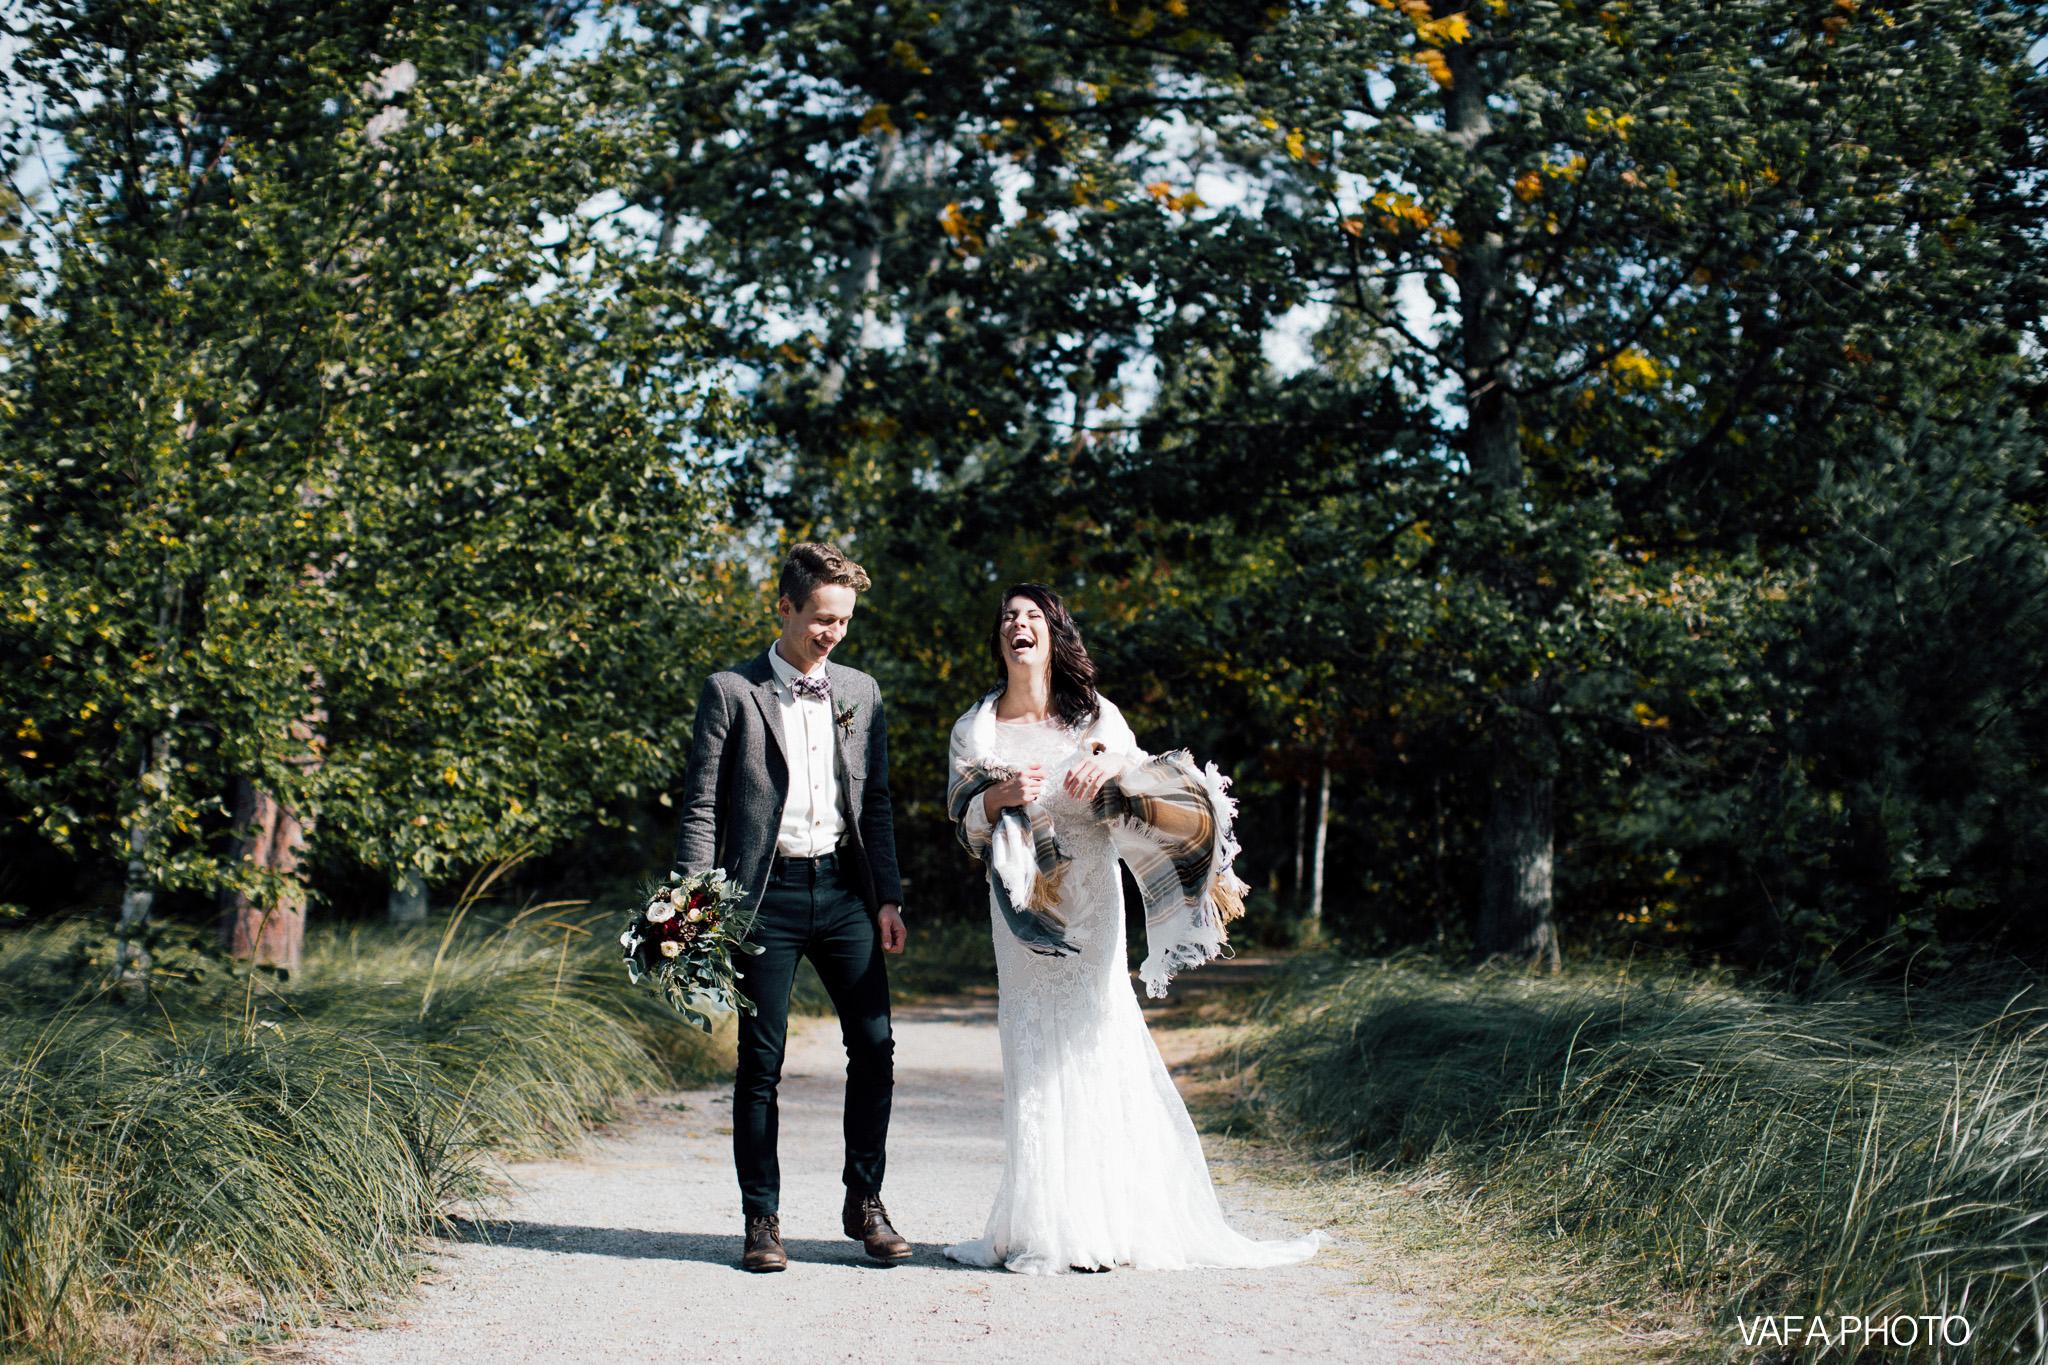 Hogback-Mountain-Wedding-Chelsea-Josh-Vafa-Photo-558.jpg